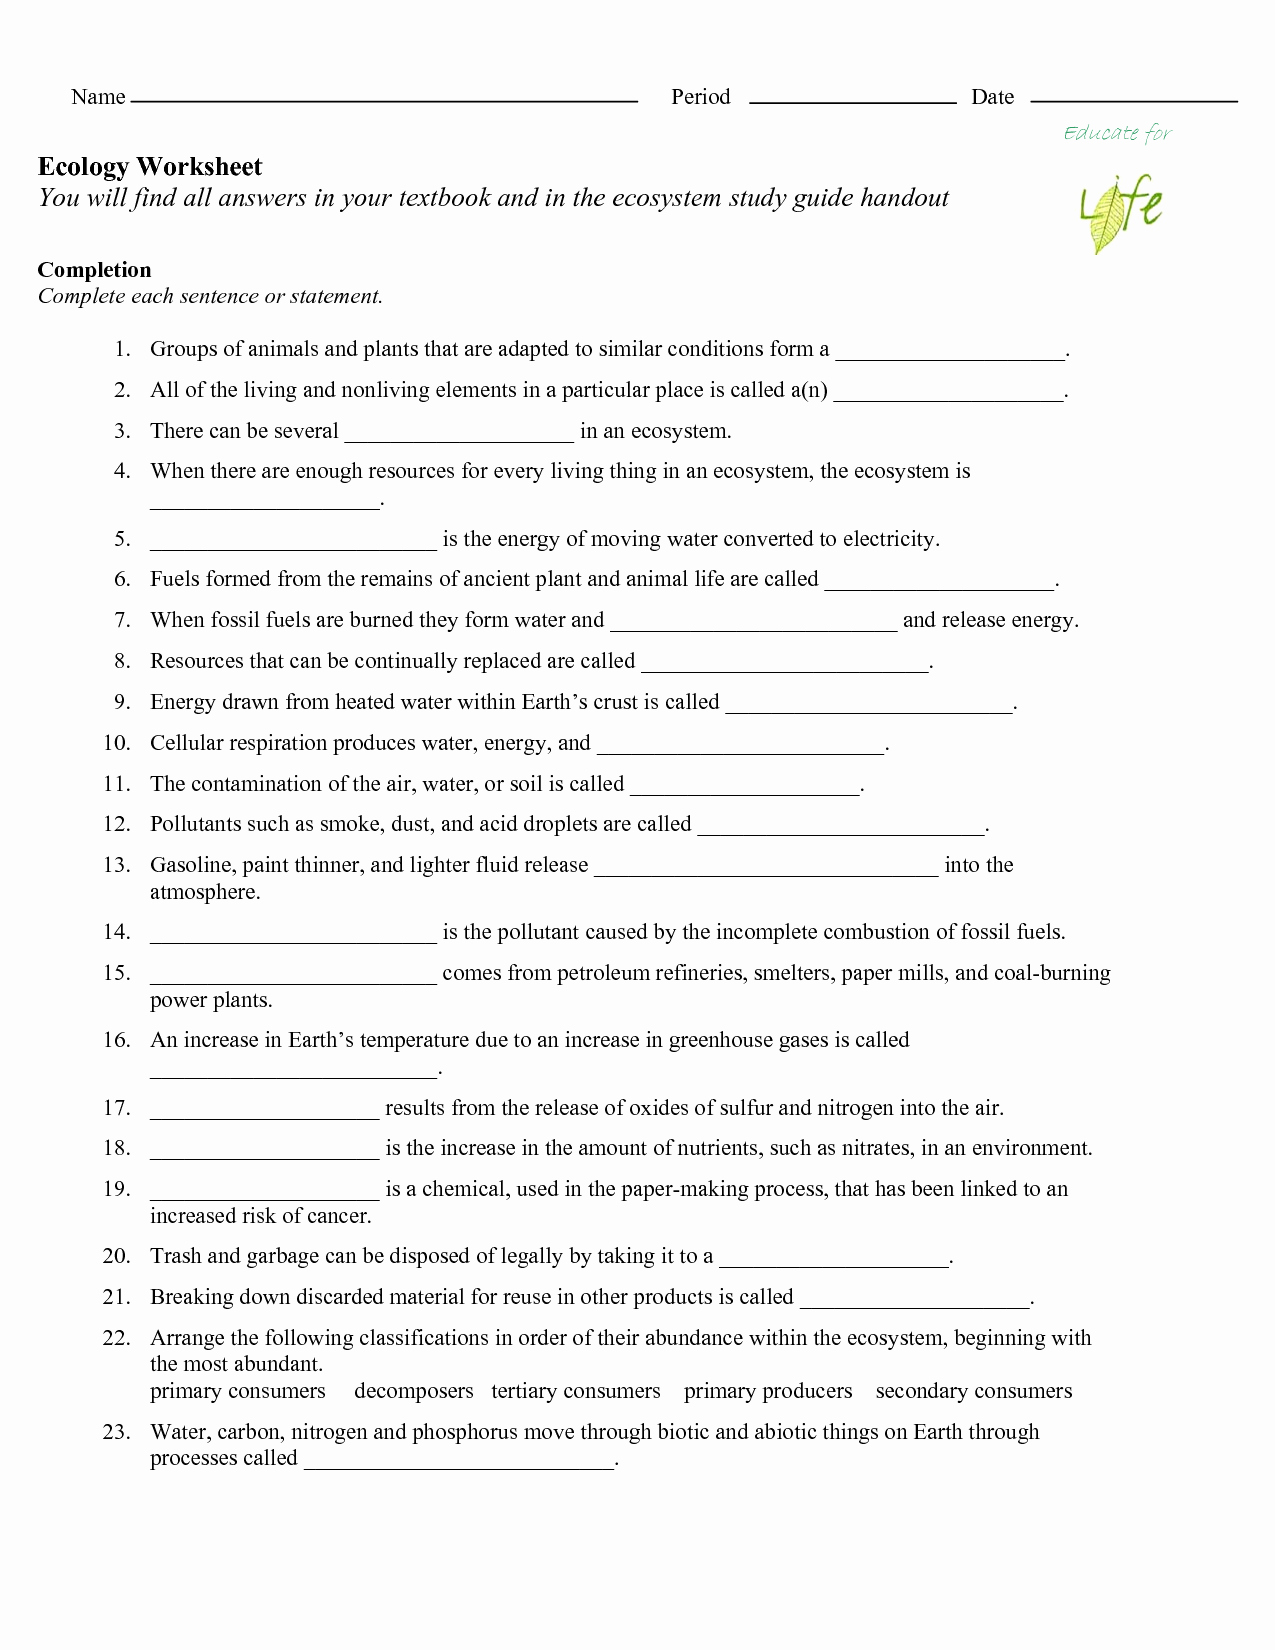 Nitrogen Cycle Worksheet Answer Key Beautiful 17 Best Of Nitrogen Cycle Worksheet Middle School